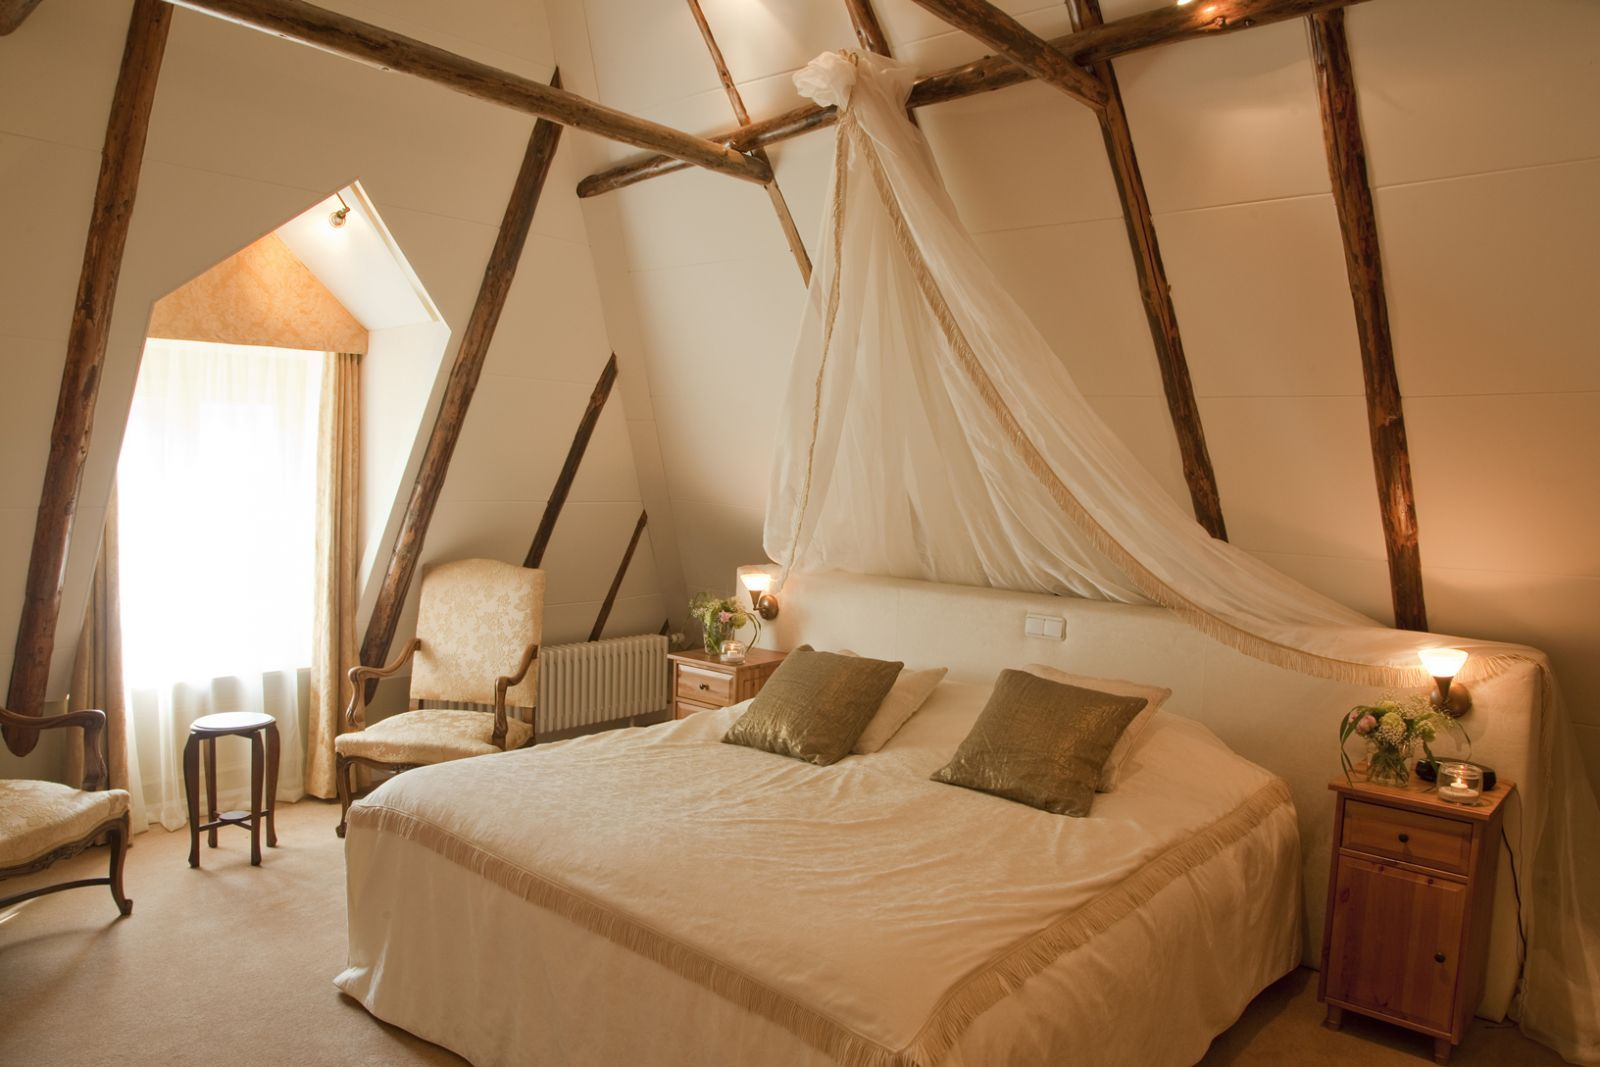 Romantische kamer in landgoed oldruitenborgh hampshire hotels